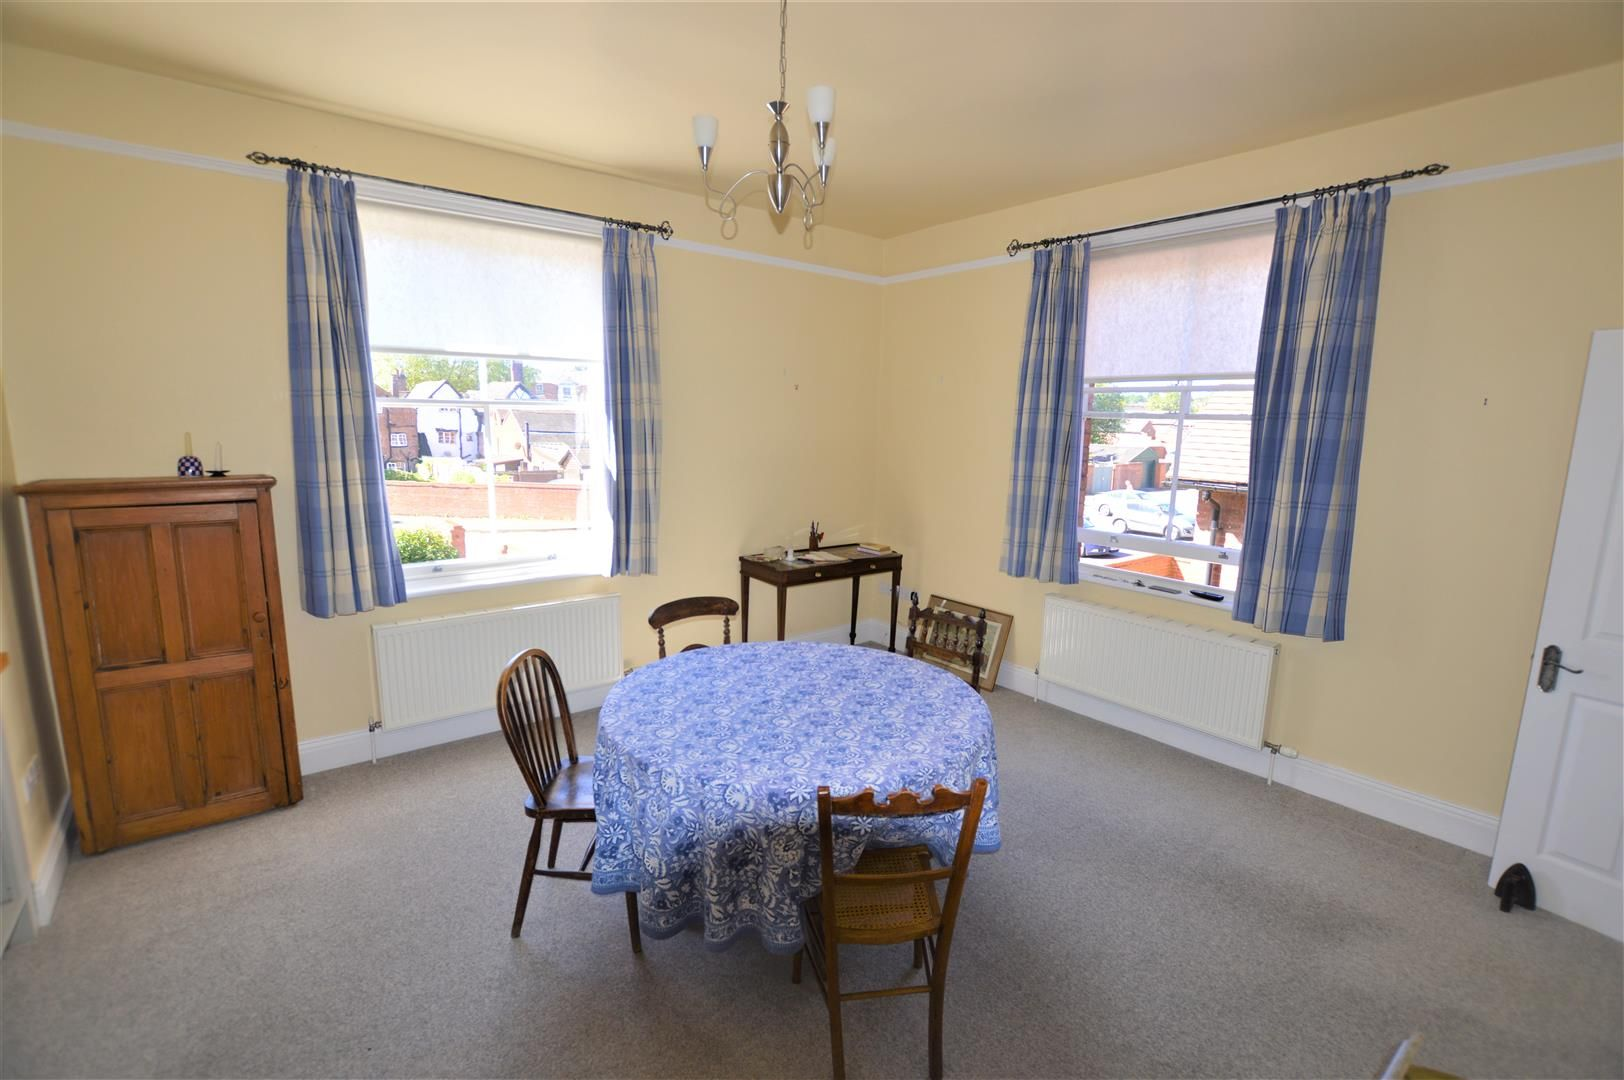 4 bed semi-detached for sale in Etnam Street, Leominster  - Property Image 4